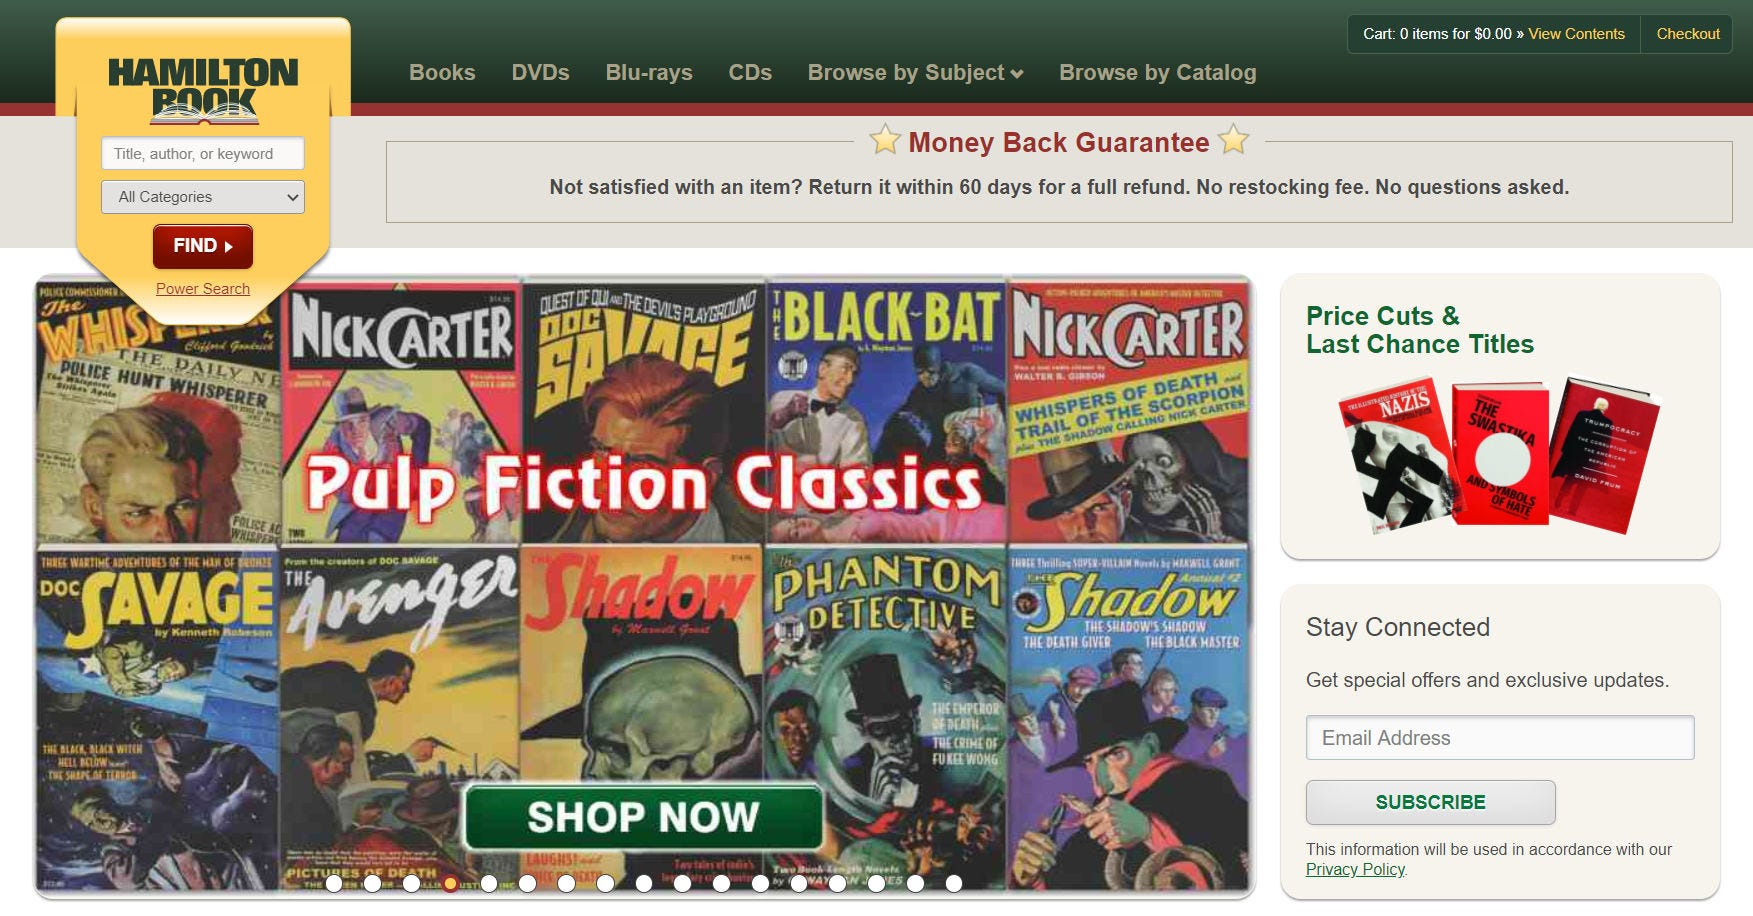 The Hamilton Book website.